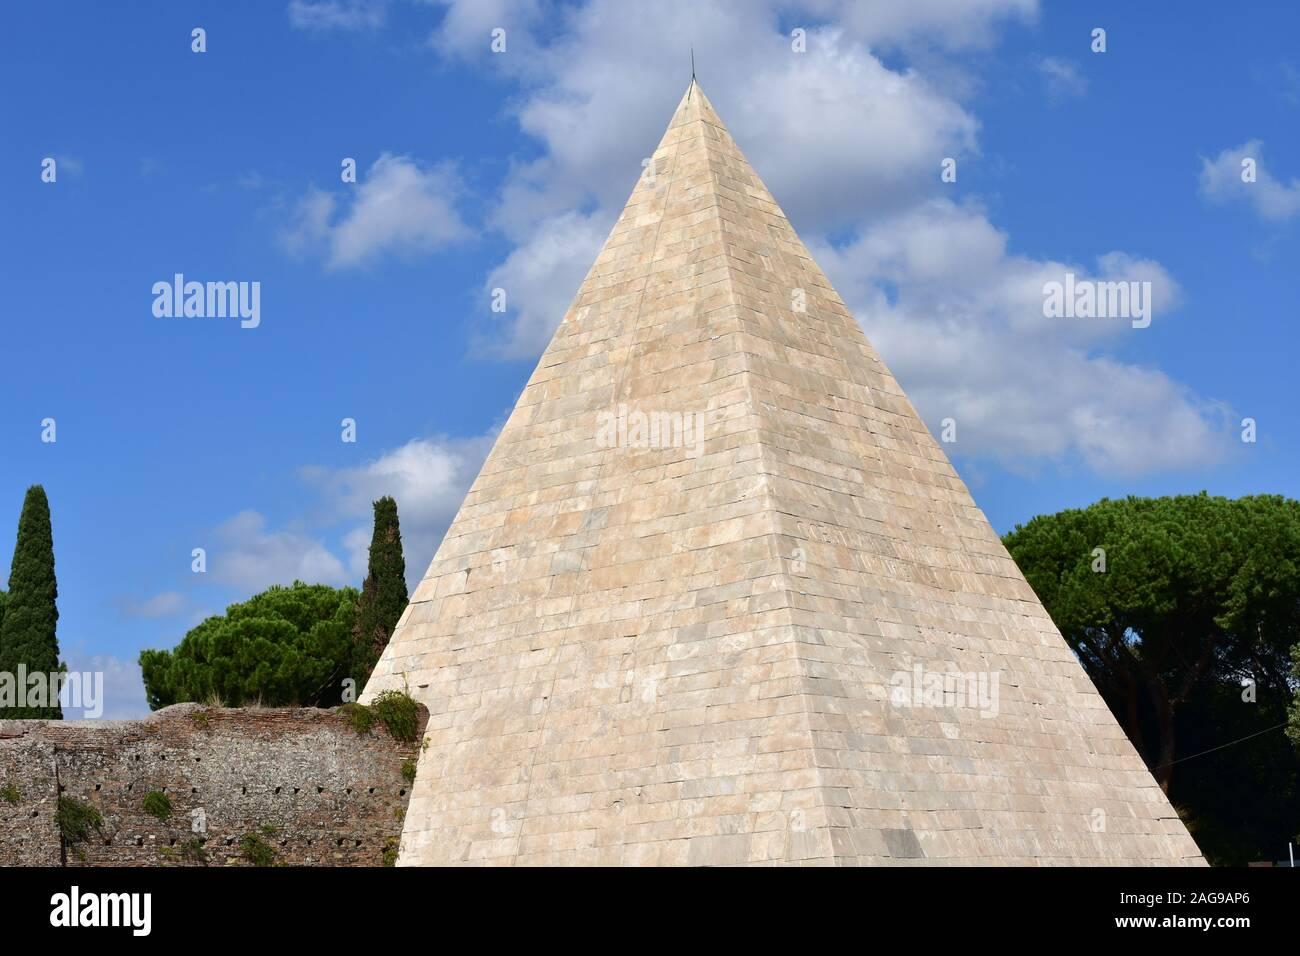 Piramide di Caio Cestio (Pyramid of Cestius) also known as Piramide Cestia. Rome, Italy. Stock Photo